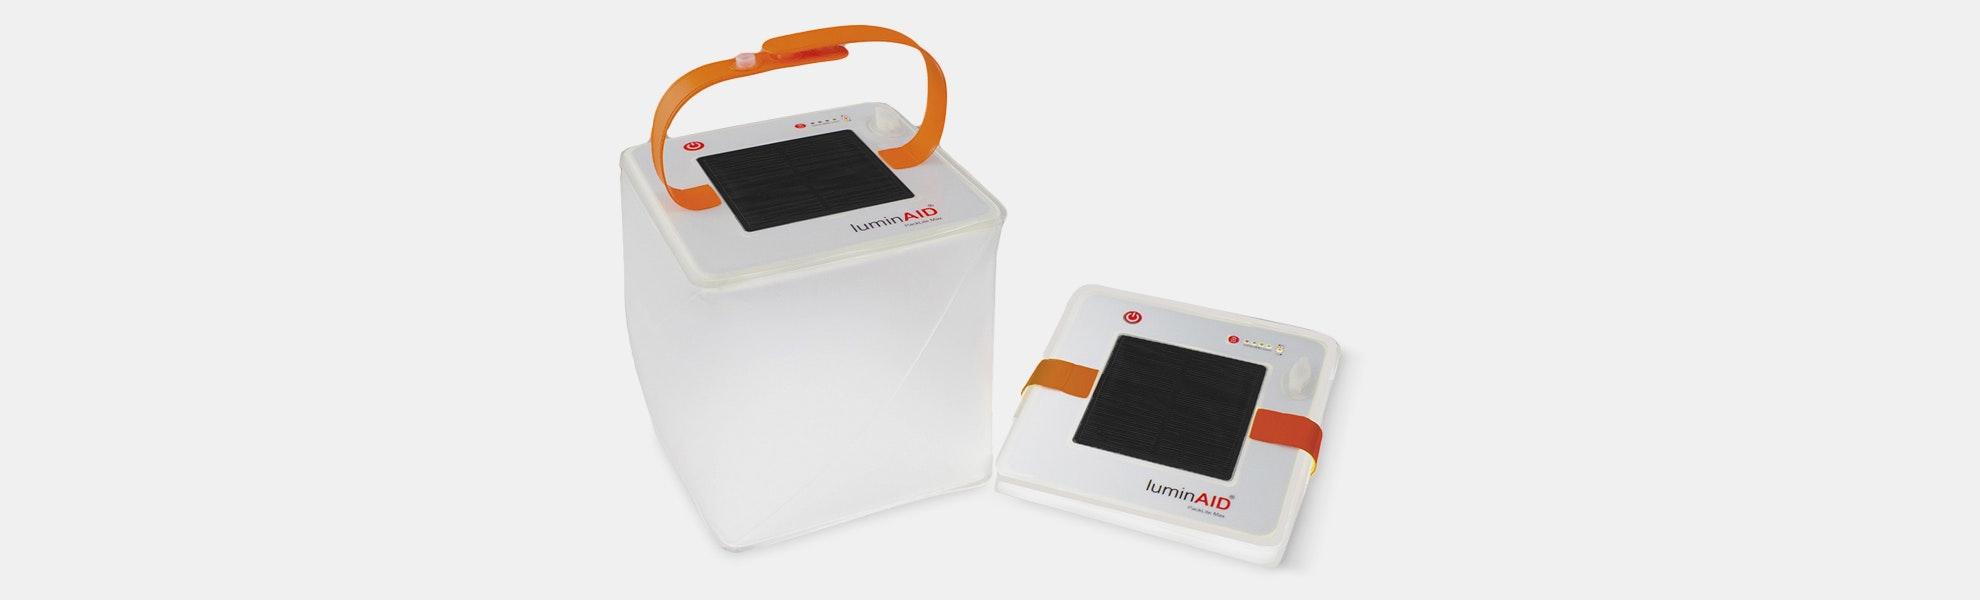 LuminAID PackLite Max USB Solar Inflatable Lantern